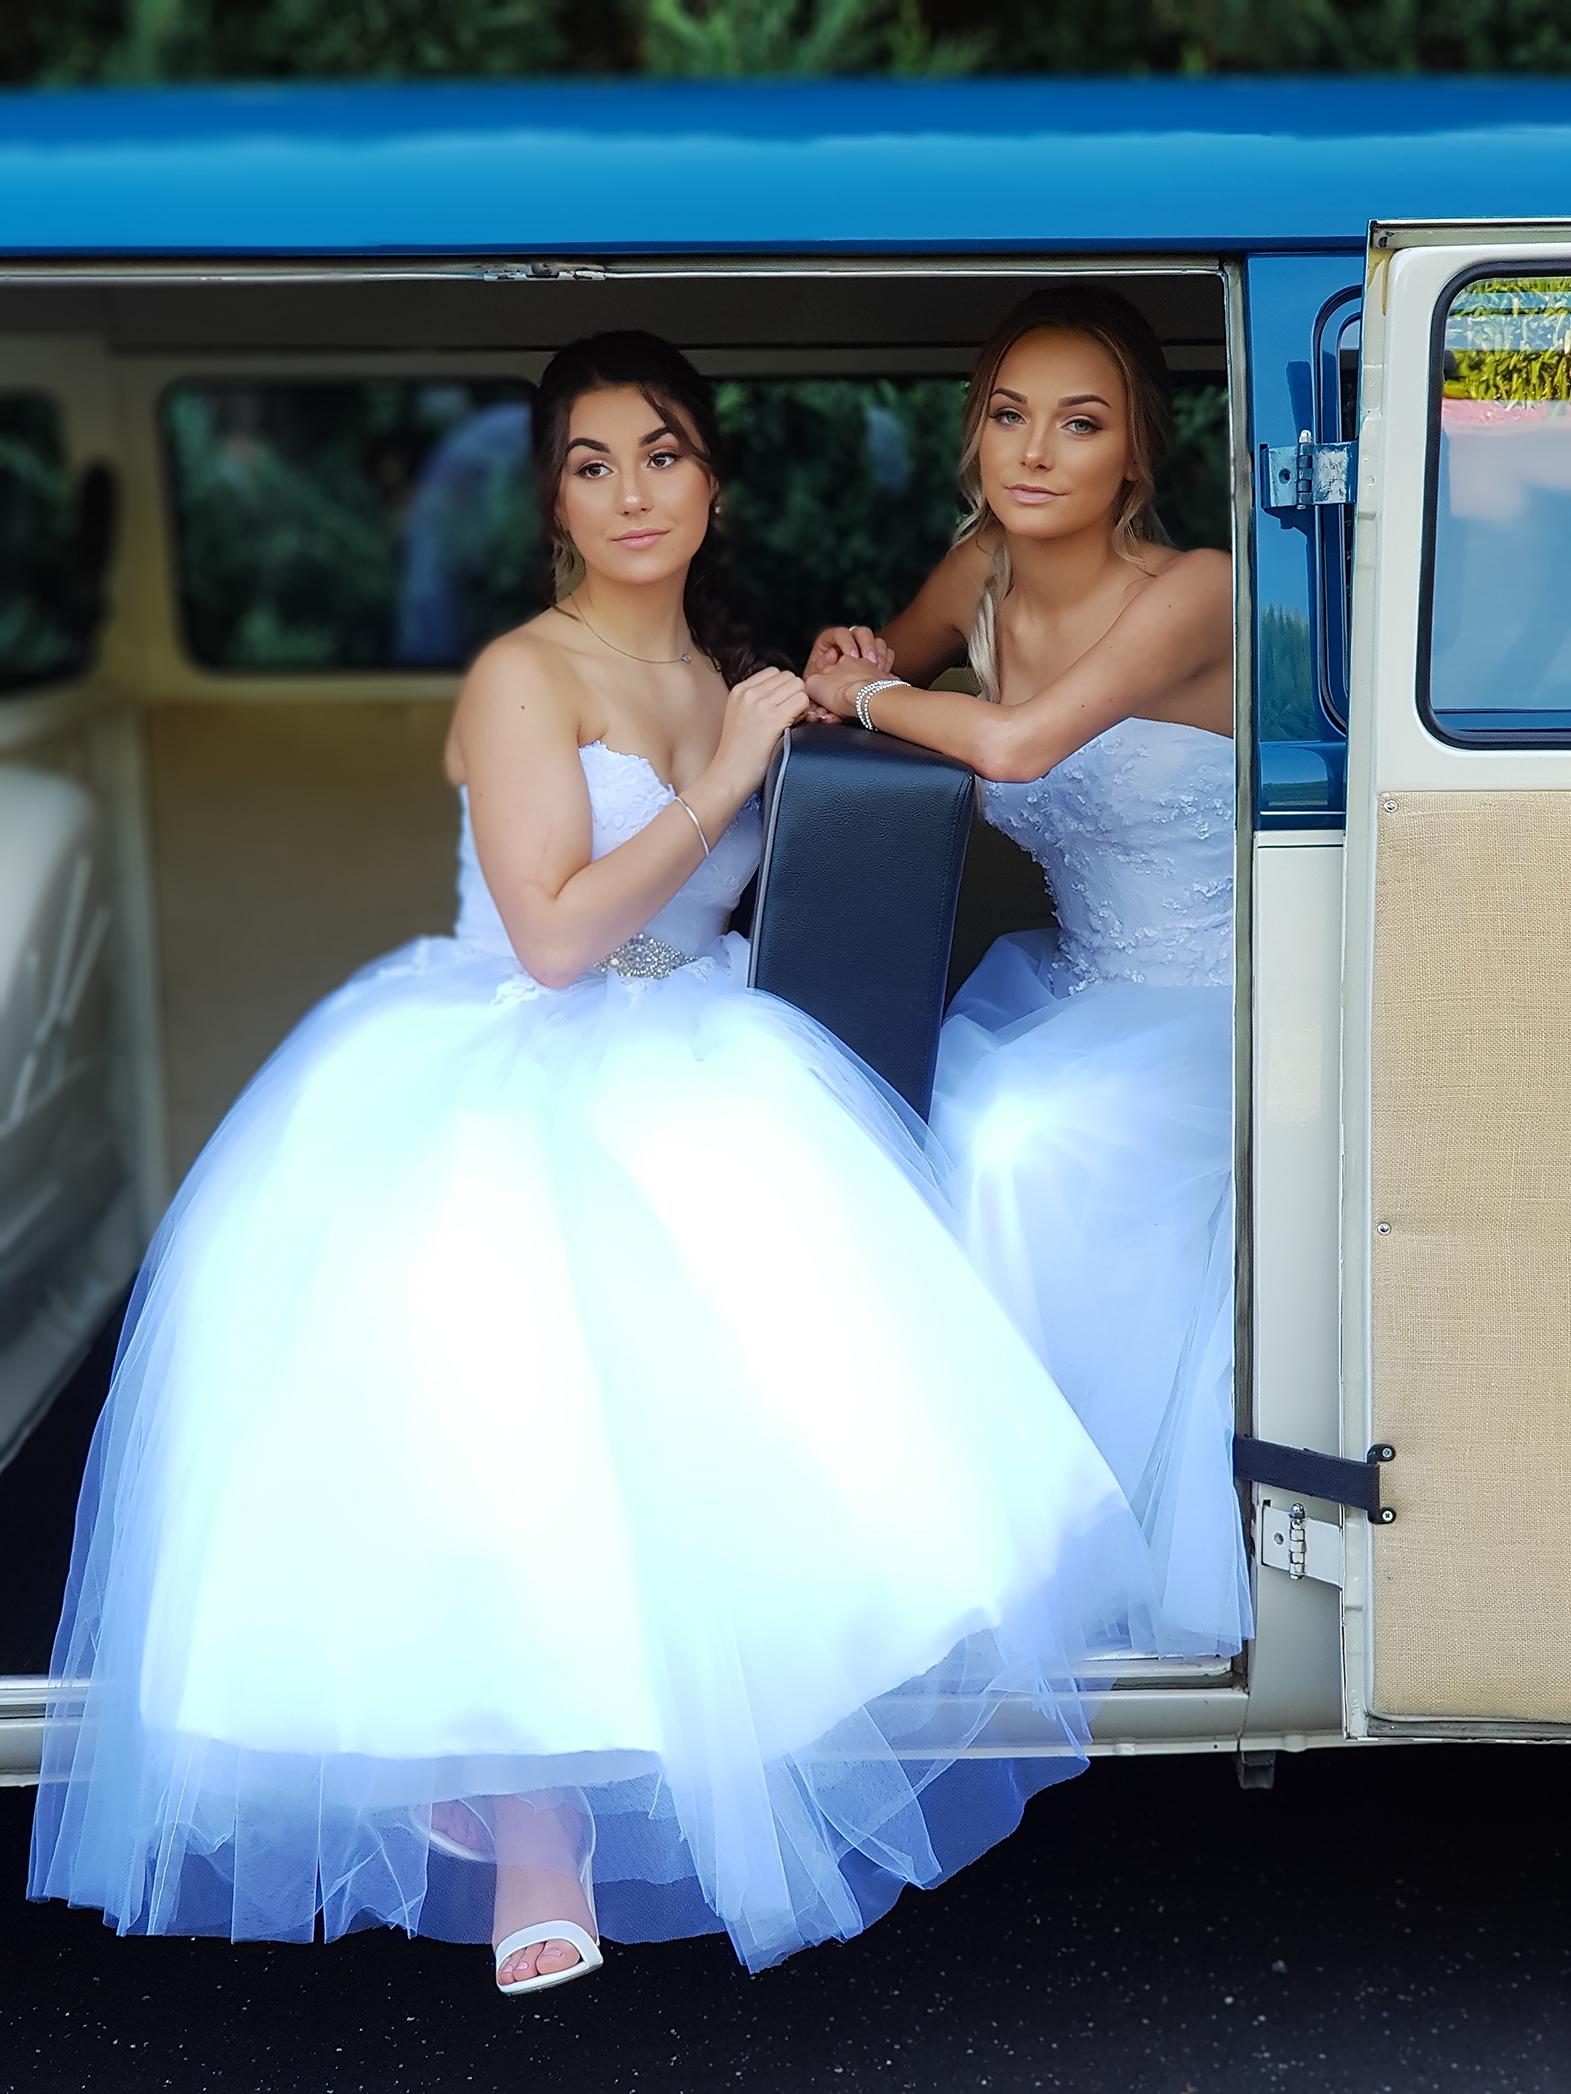 Casey Grammer Debutante Ball - Photo's by Kombi & Beetle Wedding & Debutante Car Hire (30)